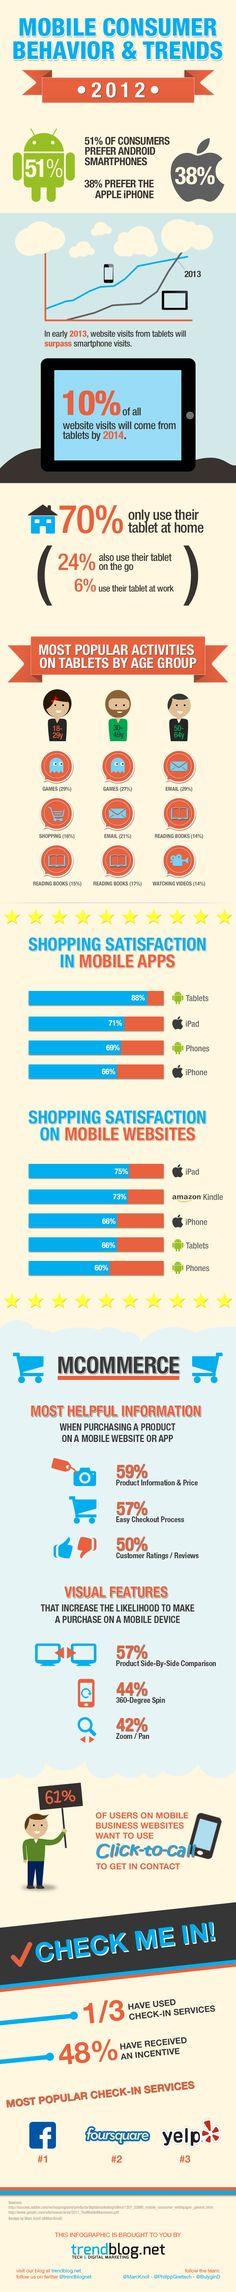 Mobile Consumer Behavior and Trends 2012 Infographic www.websitemarketingstrategies.org